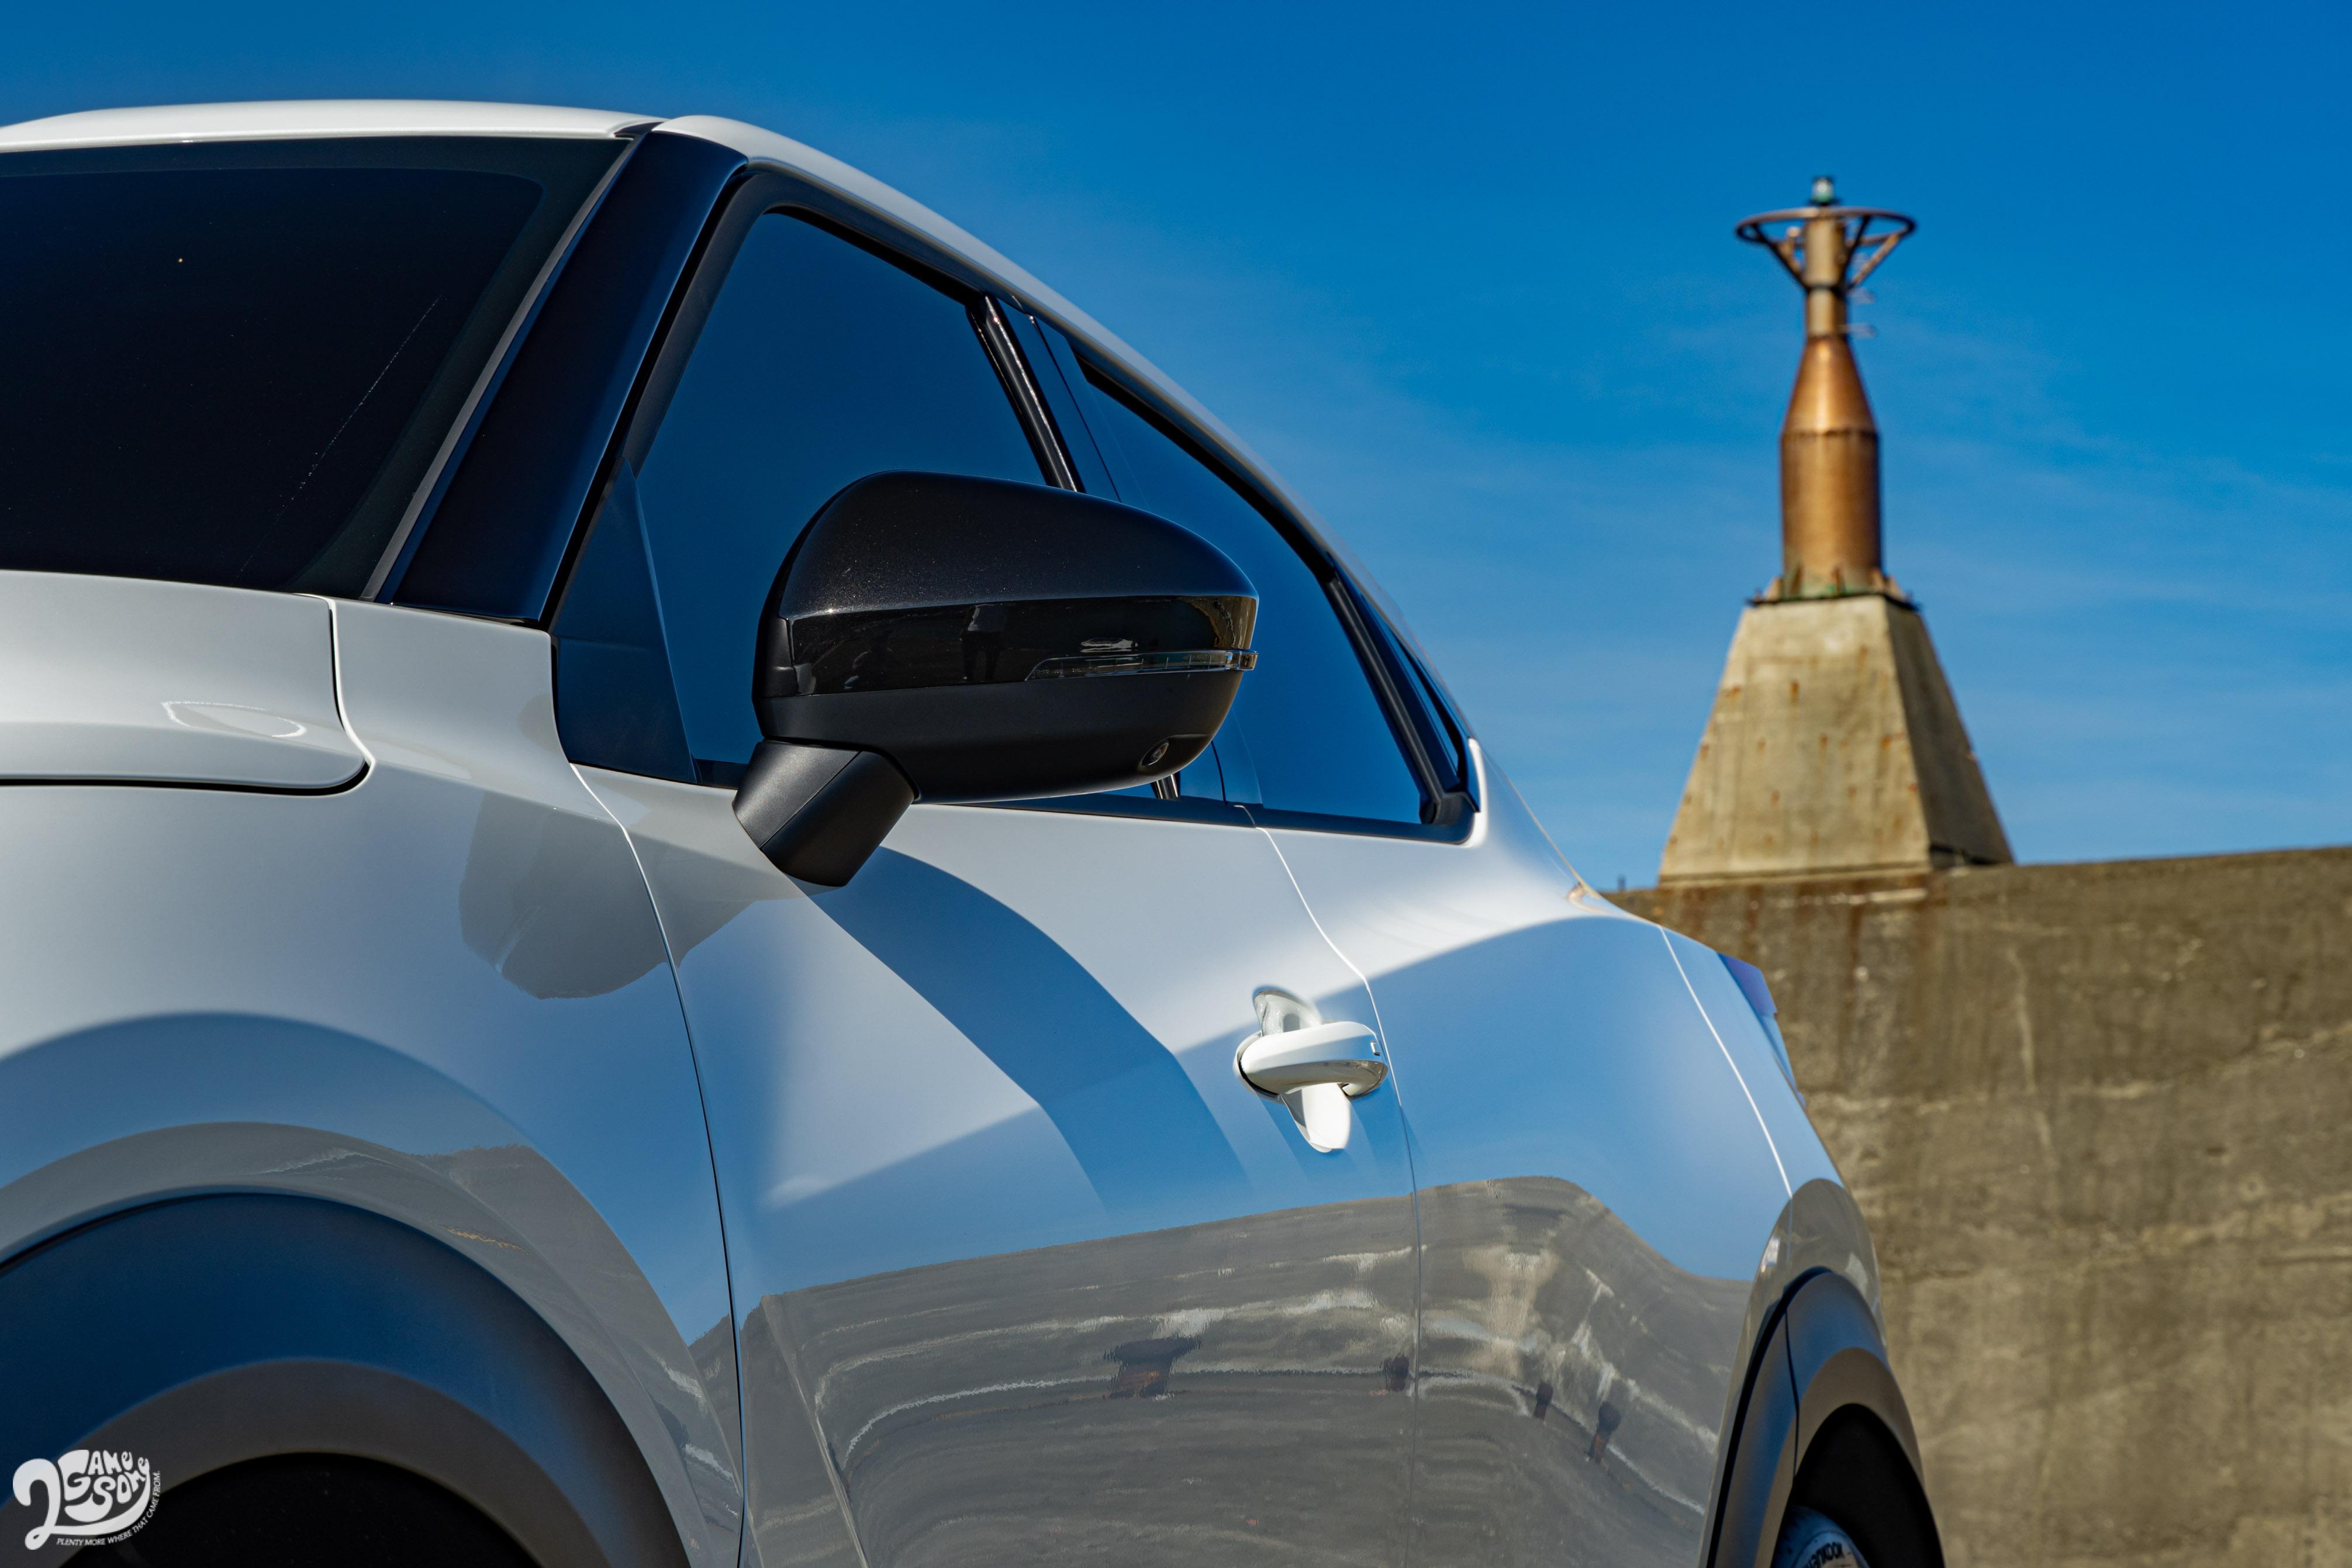 Nissan Juke 分三車型販售:英倫版 86.9 萬元、駕趣版 94.9 萬元、駕趣享樂版 98.9 萬元。